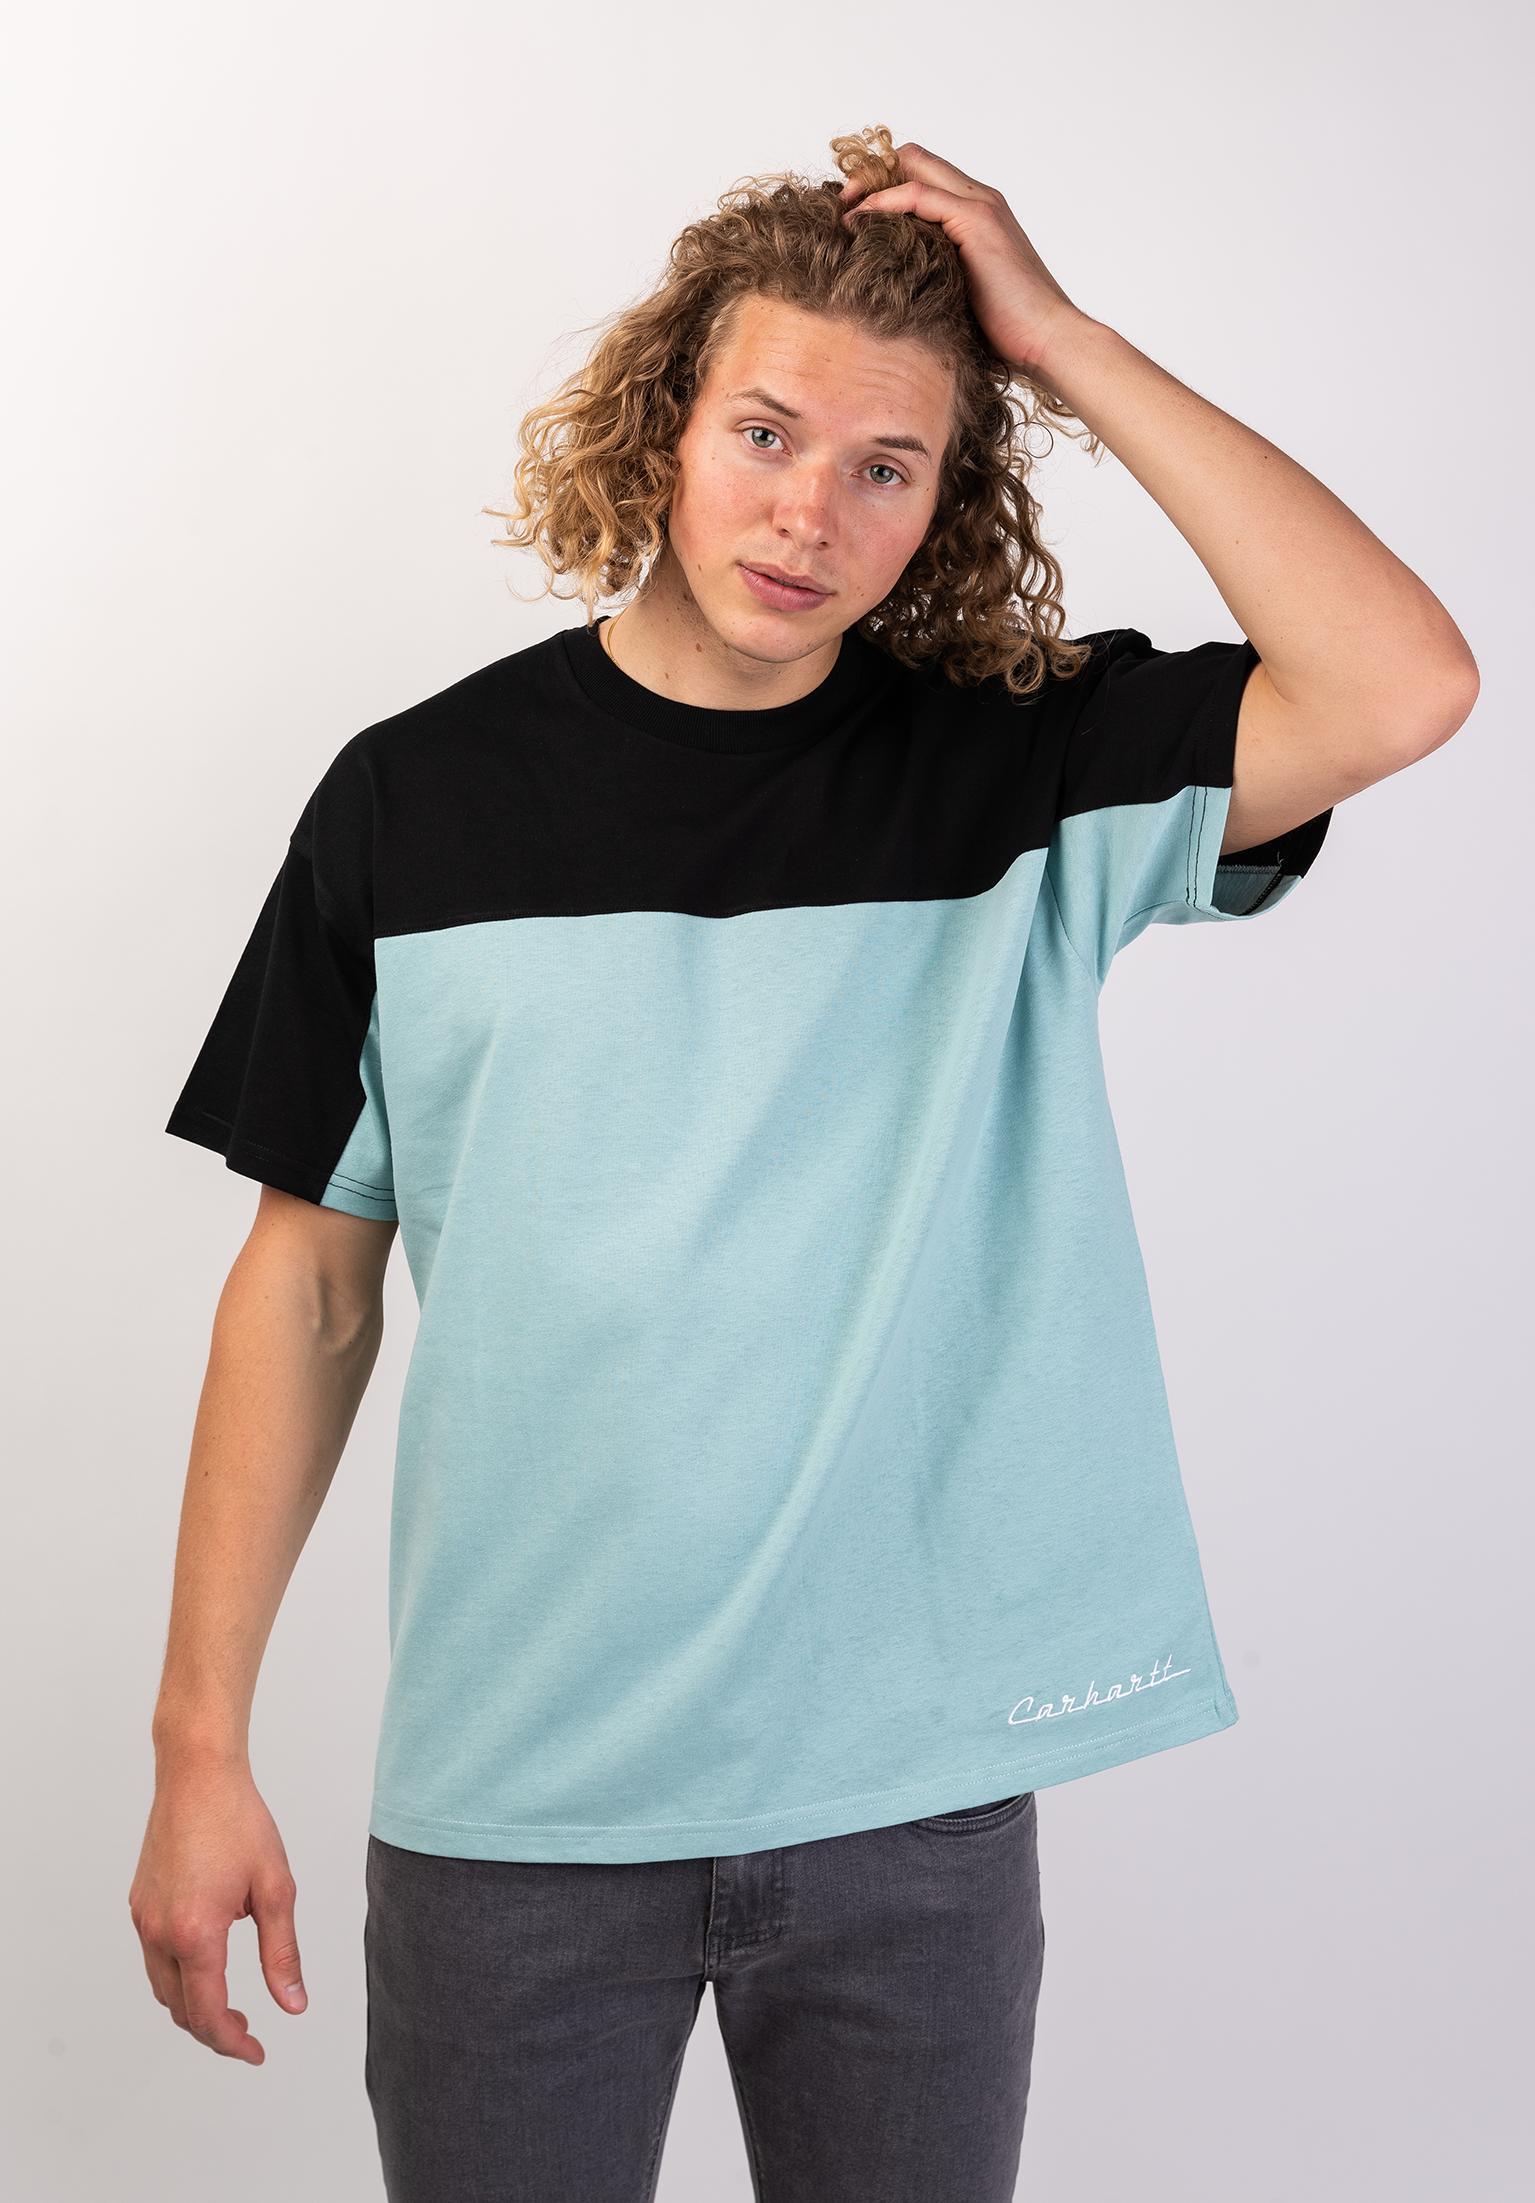 43274683ffc0b Block Retro Script Carhartt WIP T-Shirts in black-softaloe-white for Men |  Titus